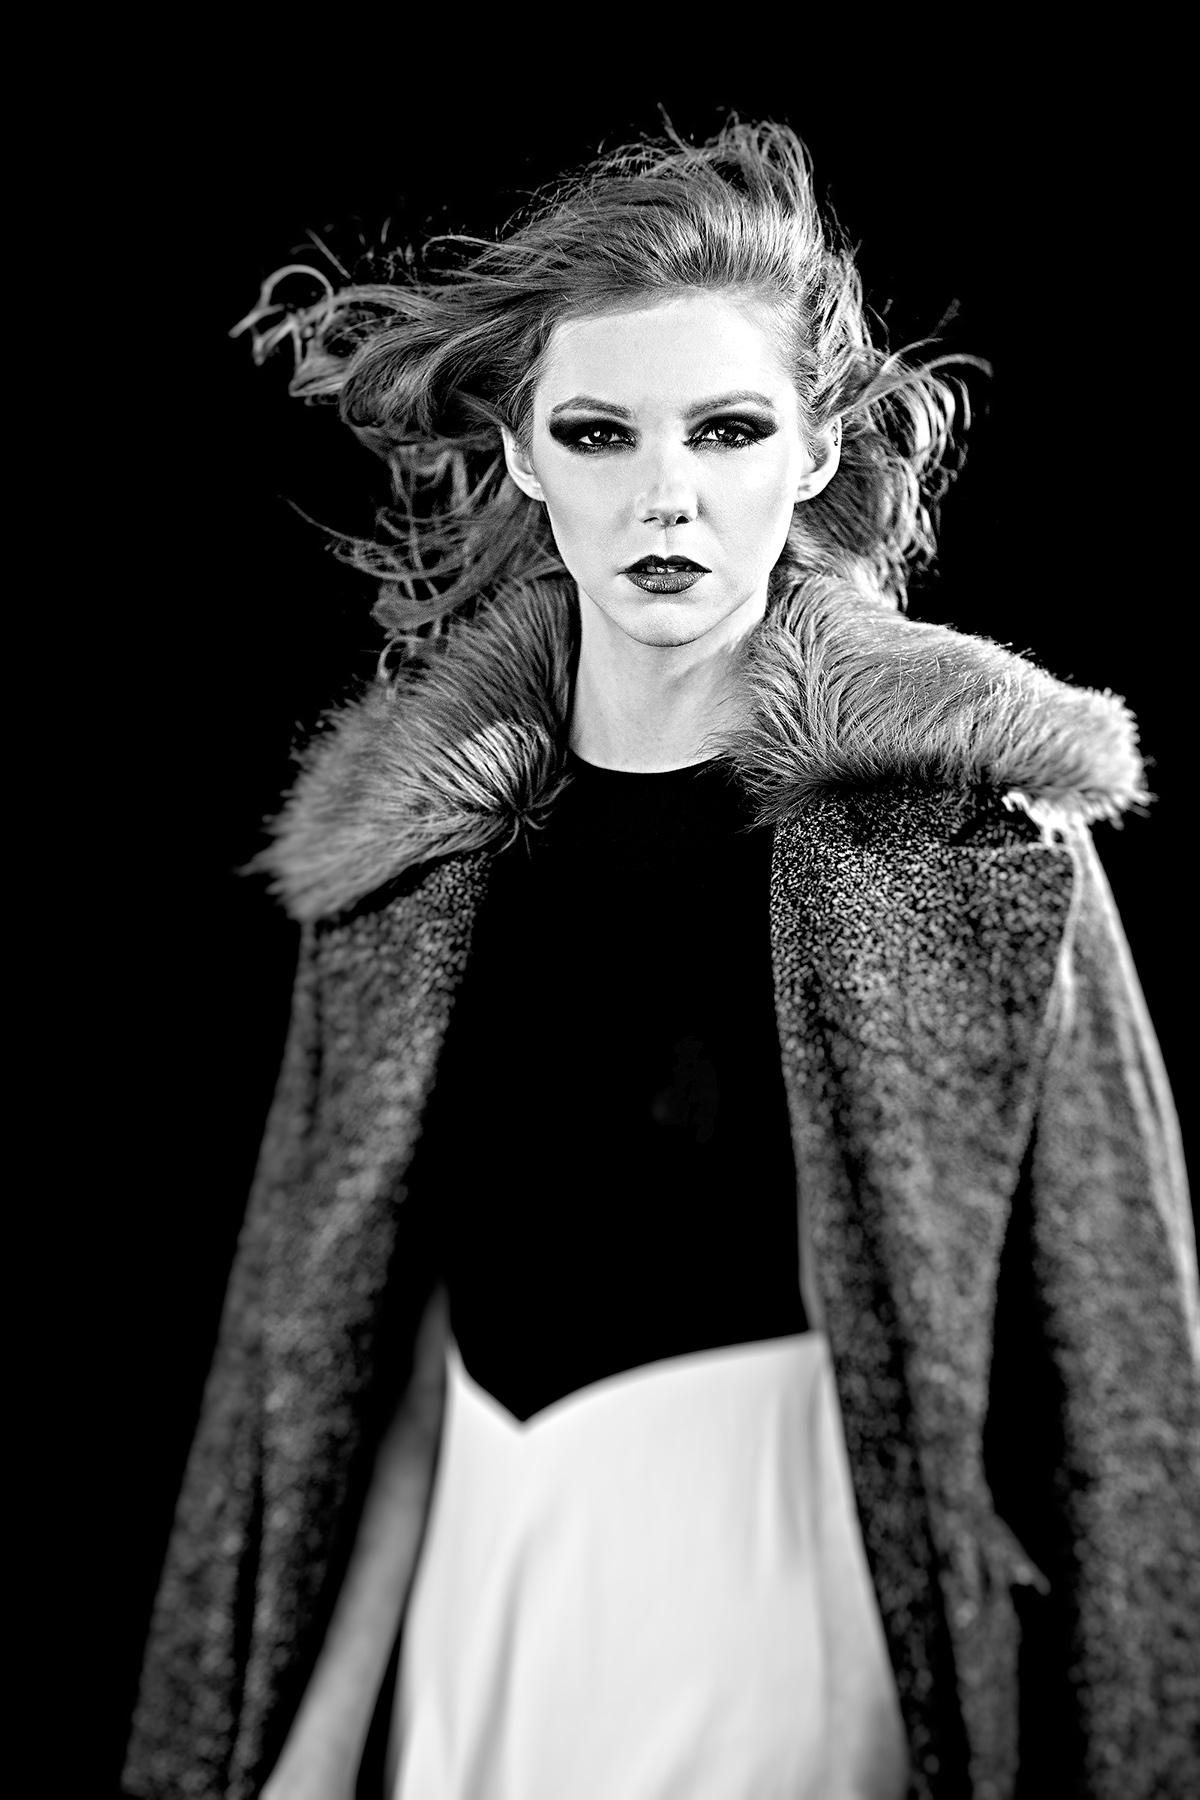 film nior Cineamatic photography fashion portraiture portraits